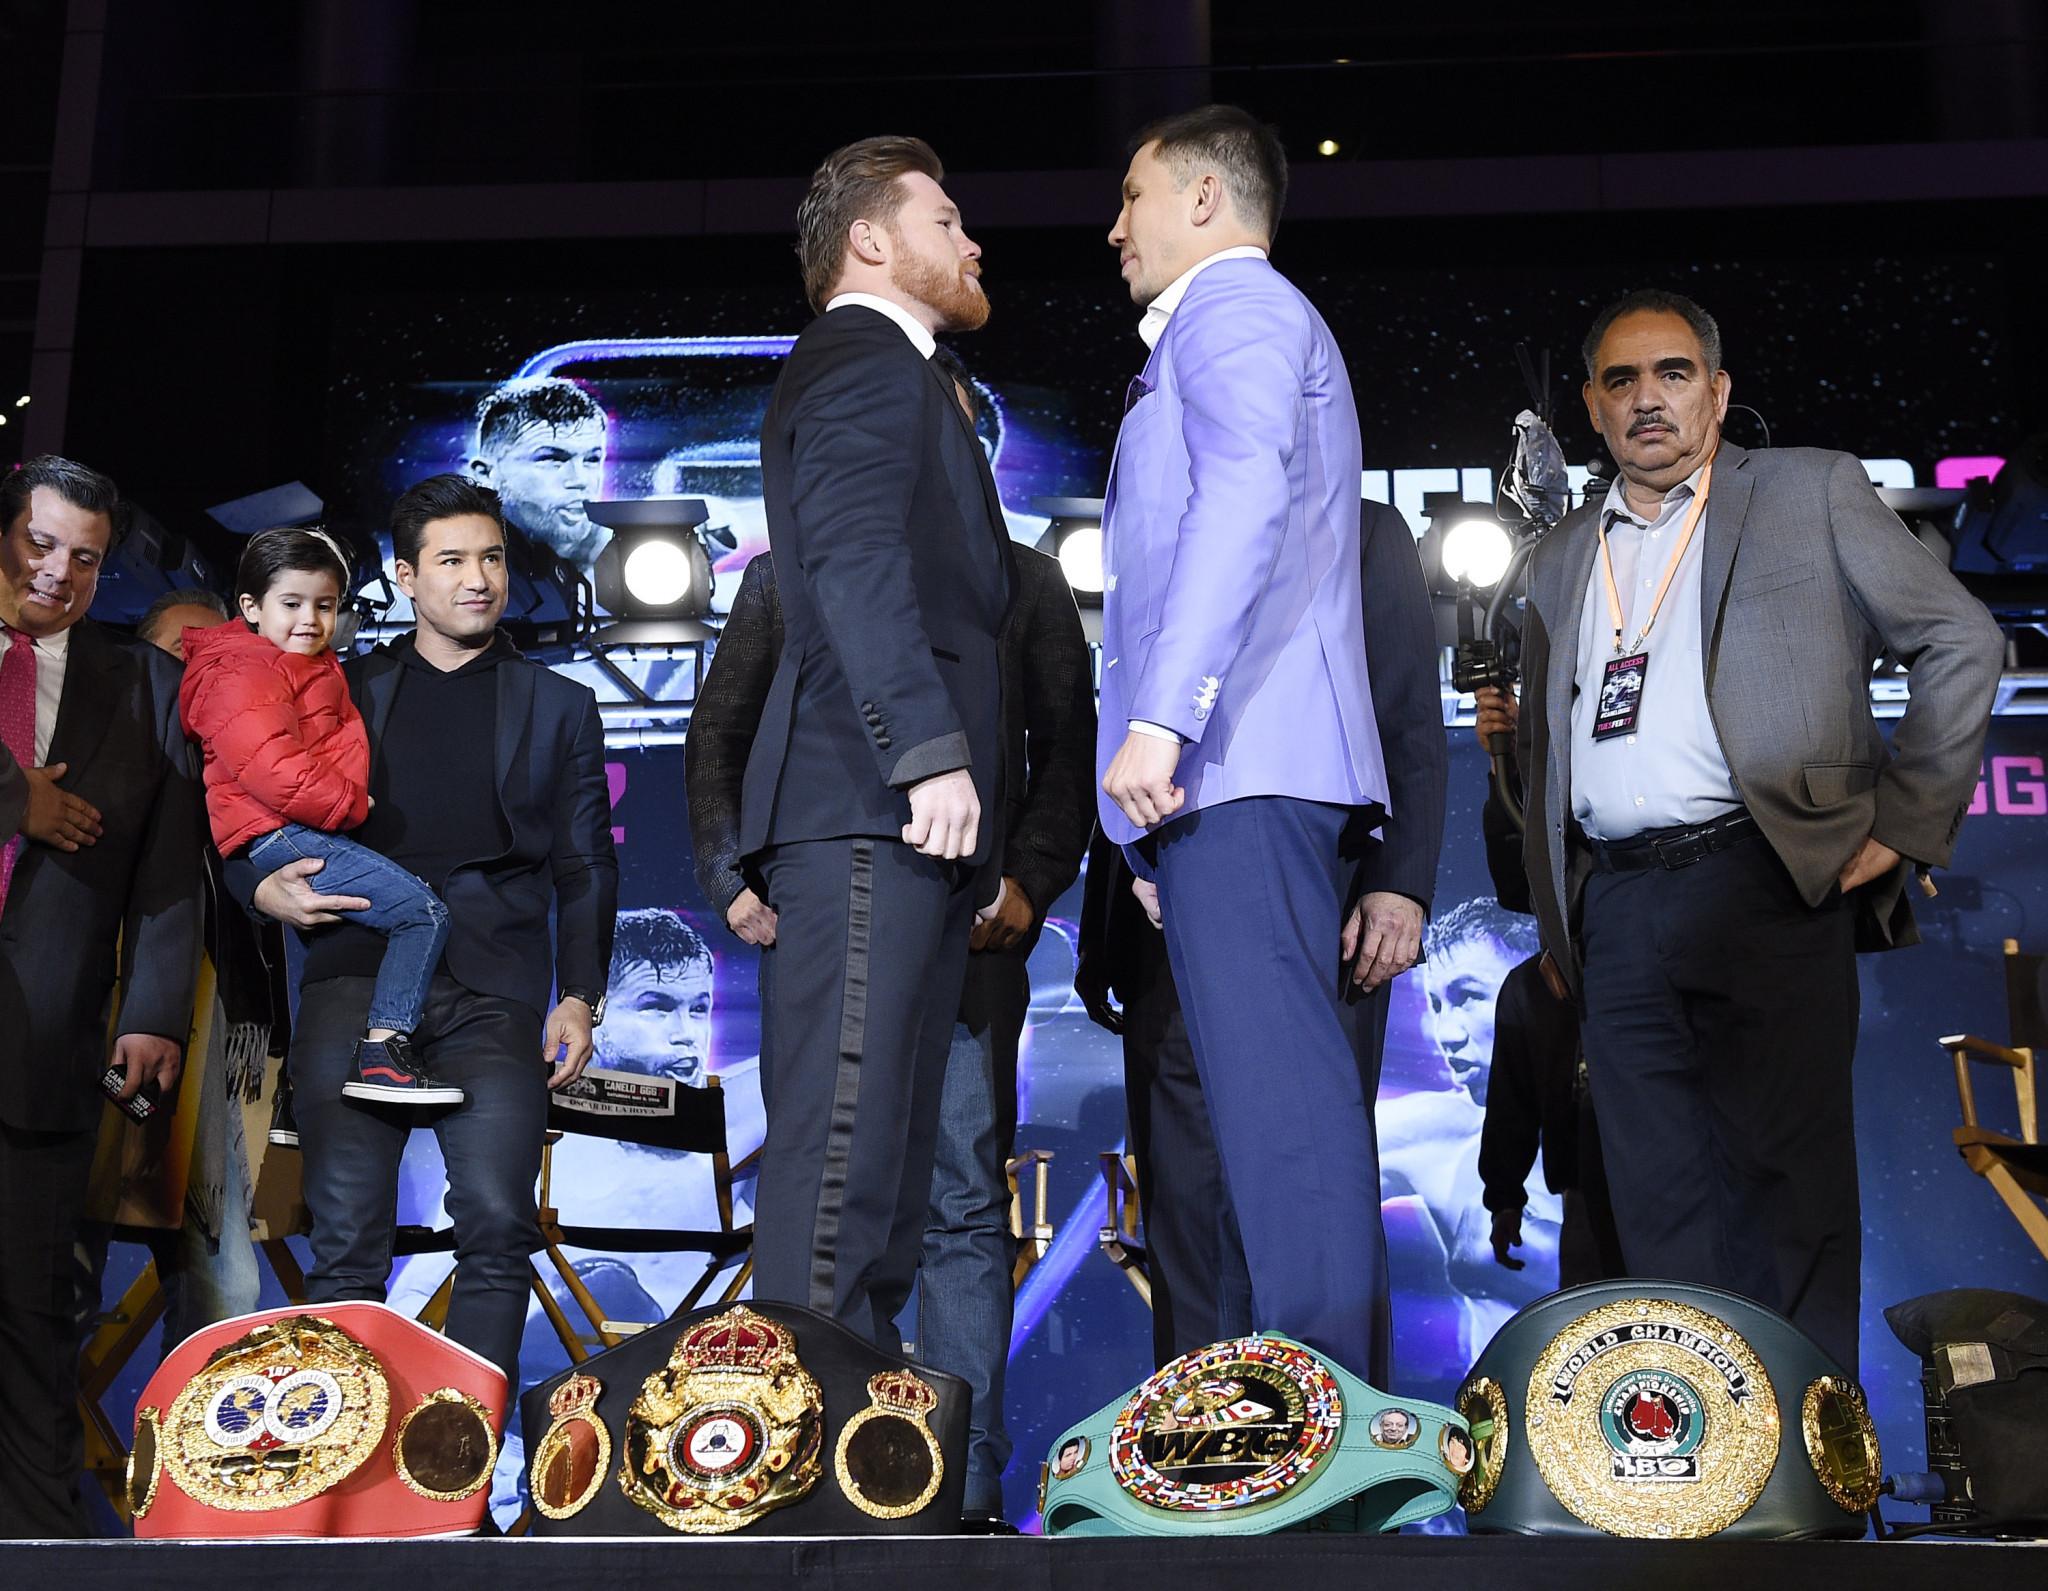 World Boxing Council President backs Alvarez after positive drugs test